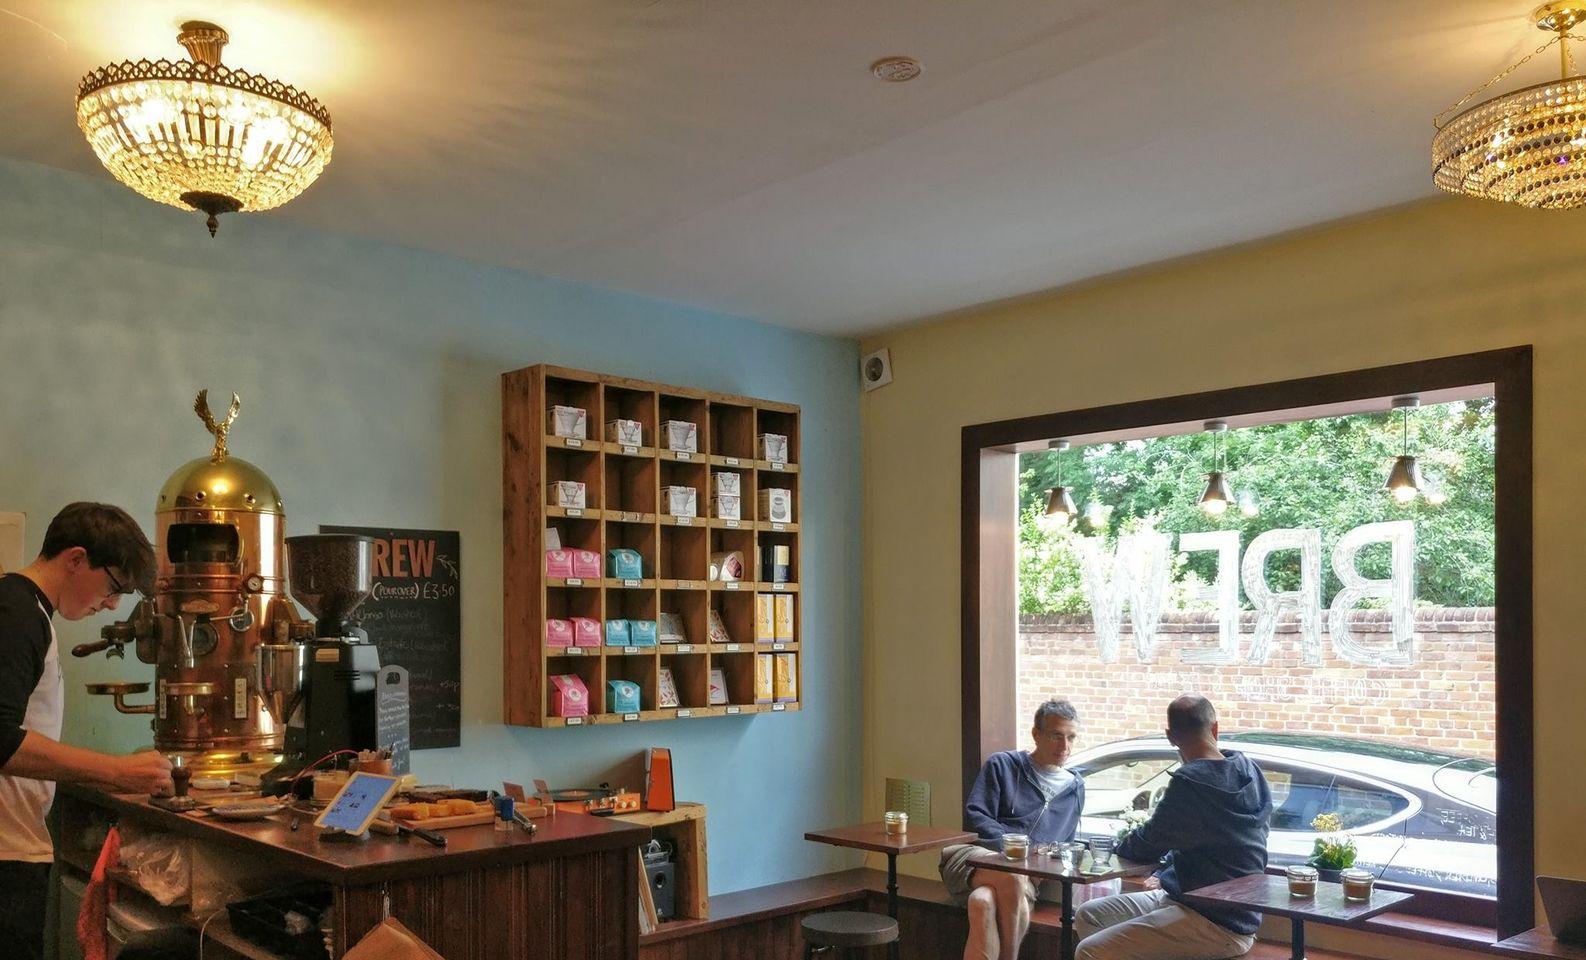 Brew Coffee Shop & Retailer, Jericho, Oxford